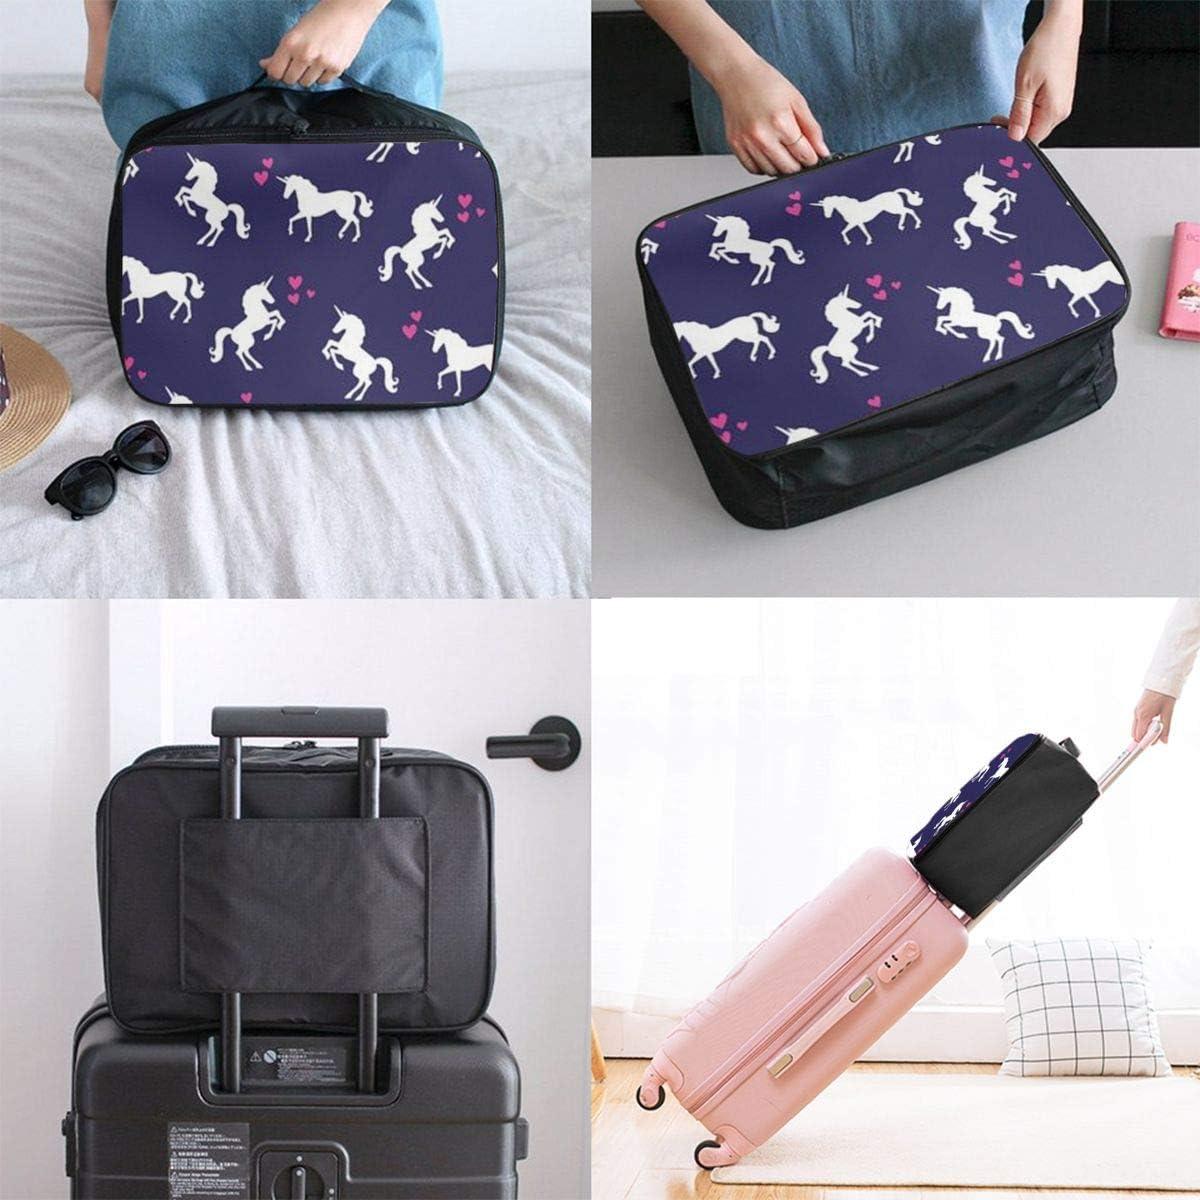 Loving Unicorn Travel Carry-on Luggage Weekender Bag Overnight Tote Flight Duffel In Trolley Handle